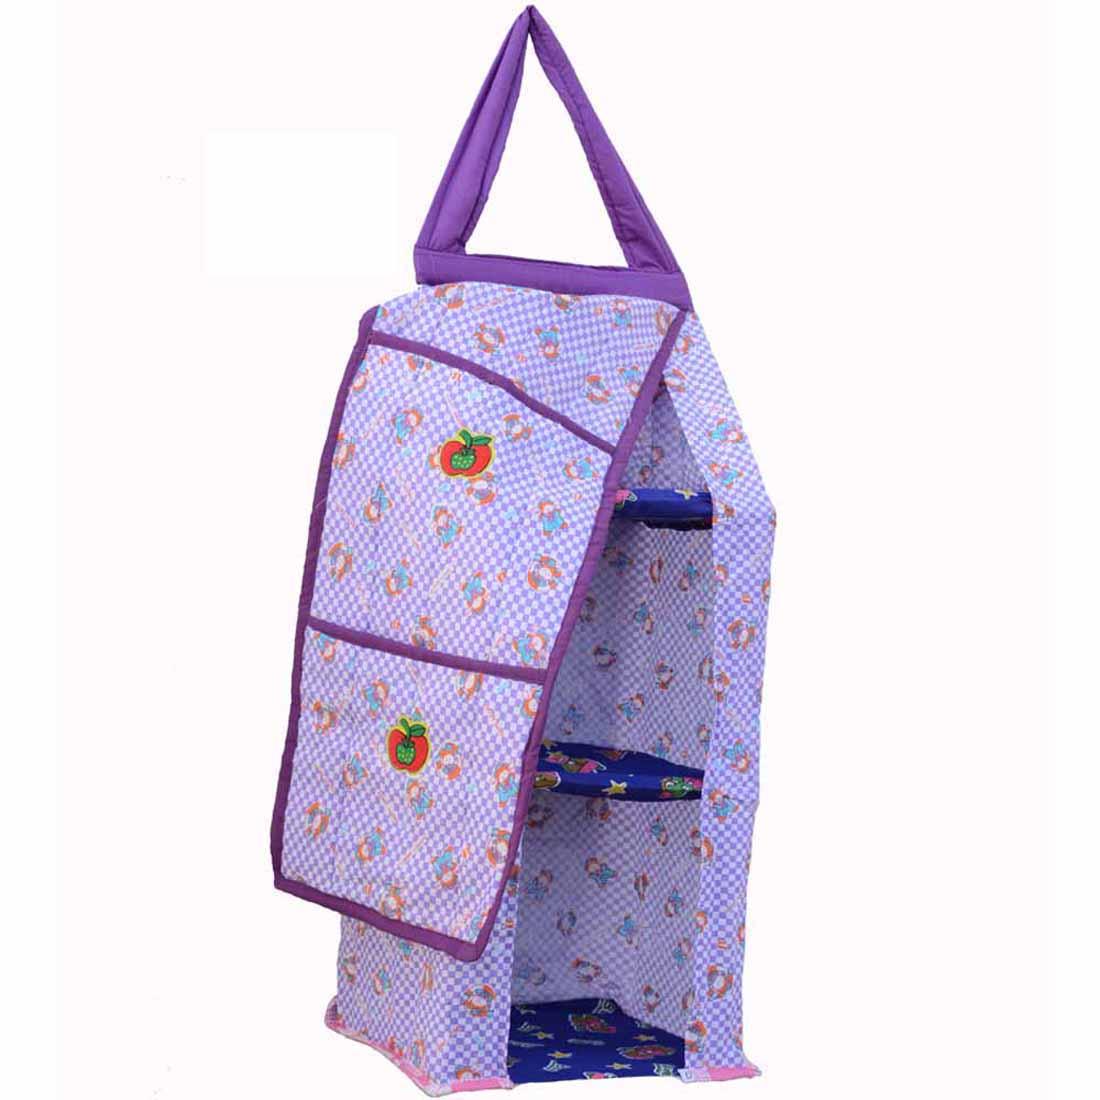 hanging chair flipkart santa covers amazon srim smc0052 cotton collapsible wardrobe price in india